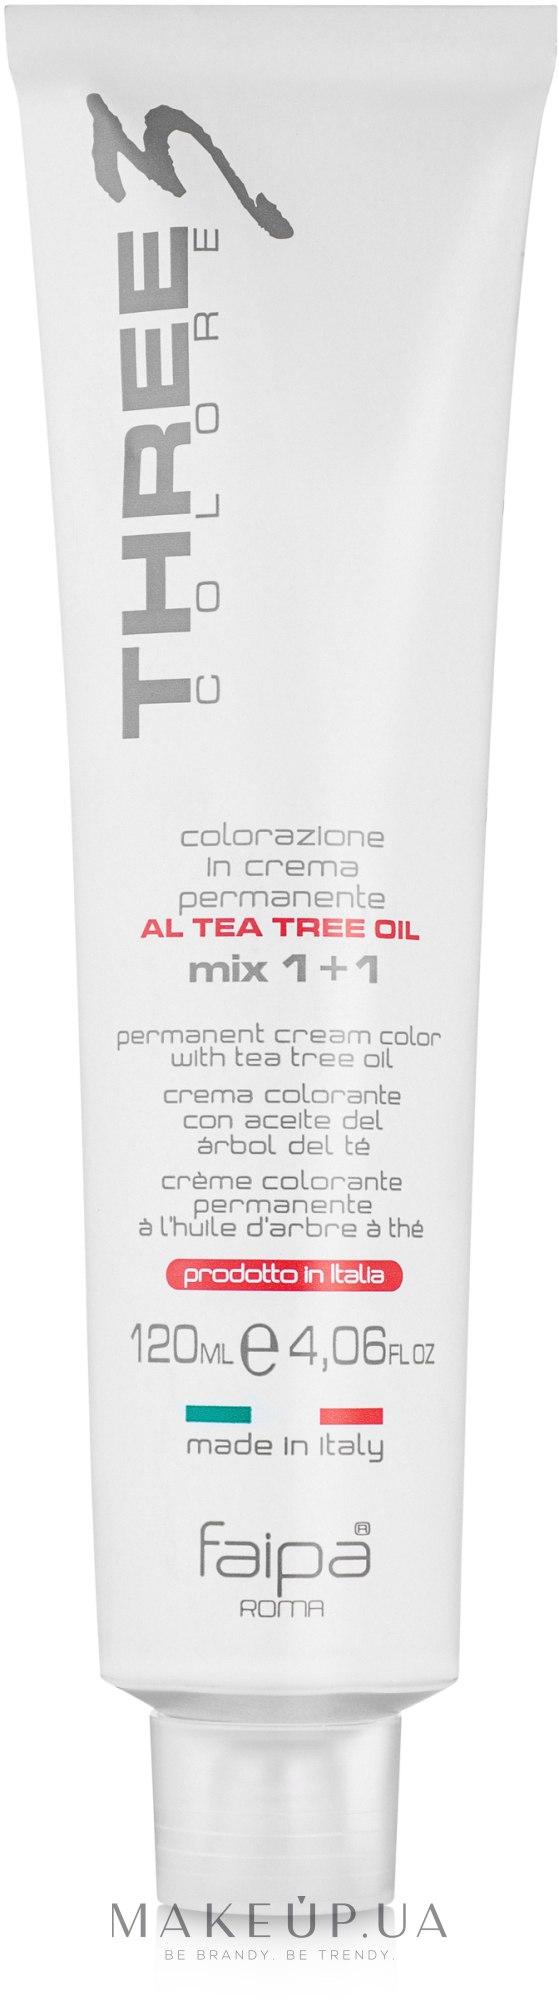 Краска для волос с маслом чайного дерева - Faipa Roma Three Colore Permanent Cream Color — фото N2